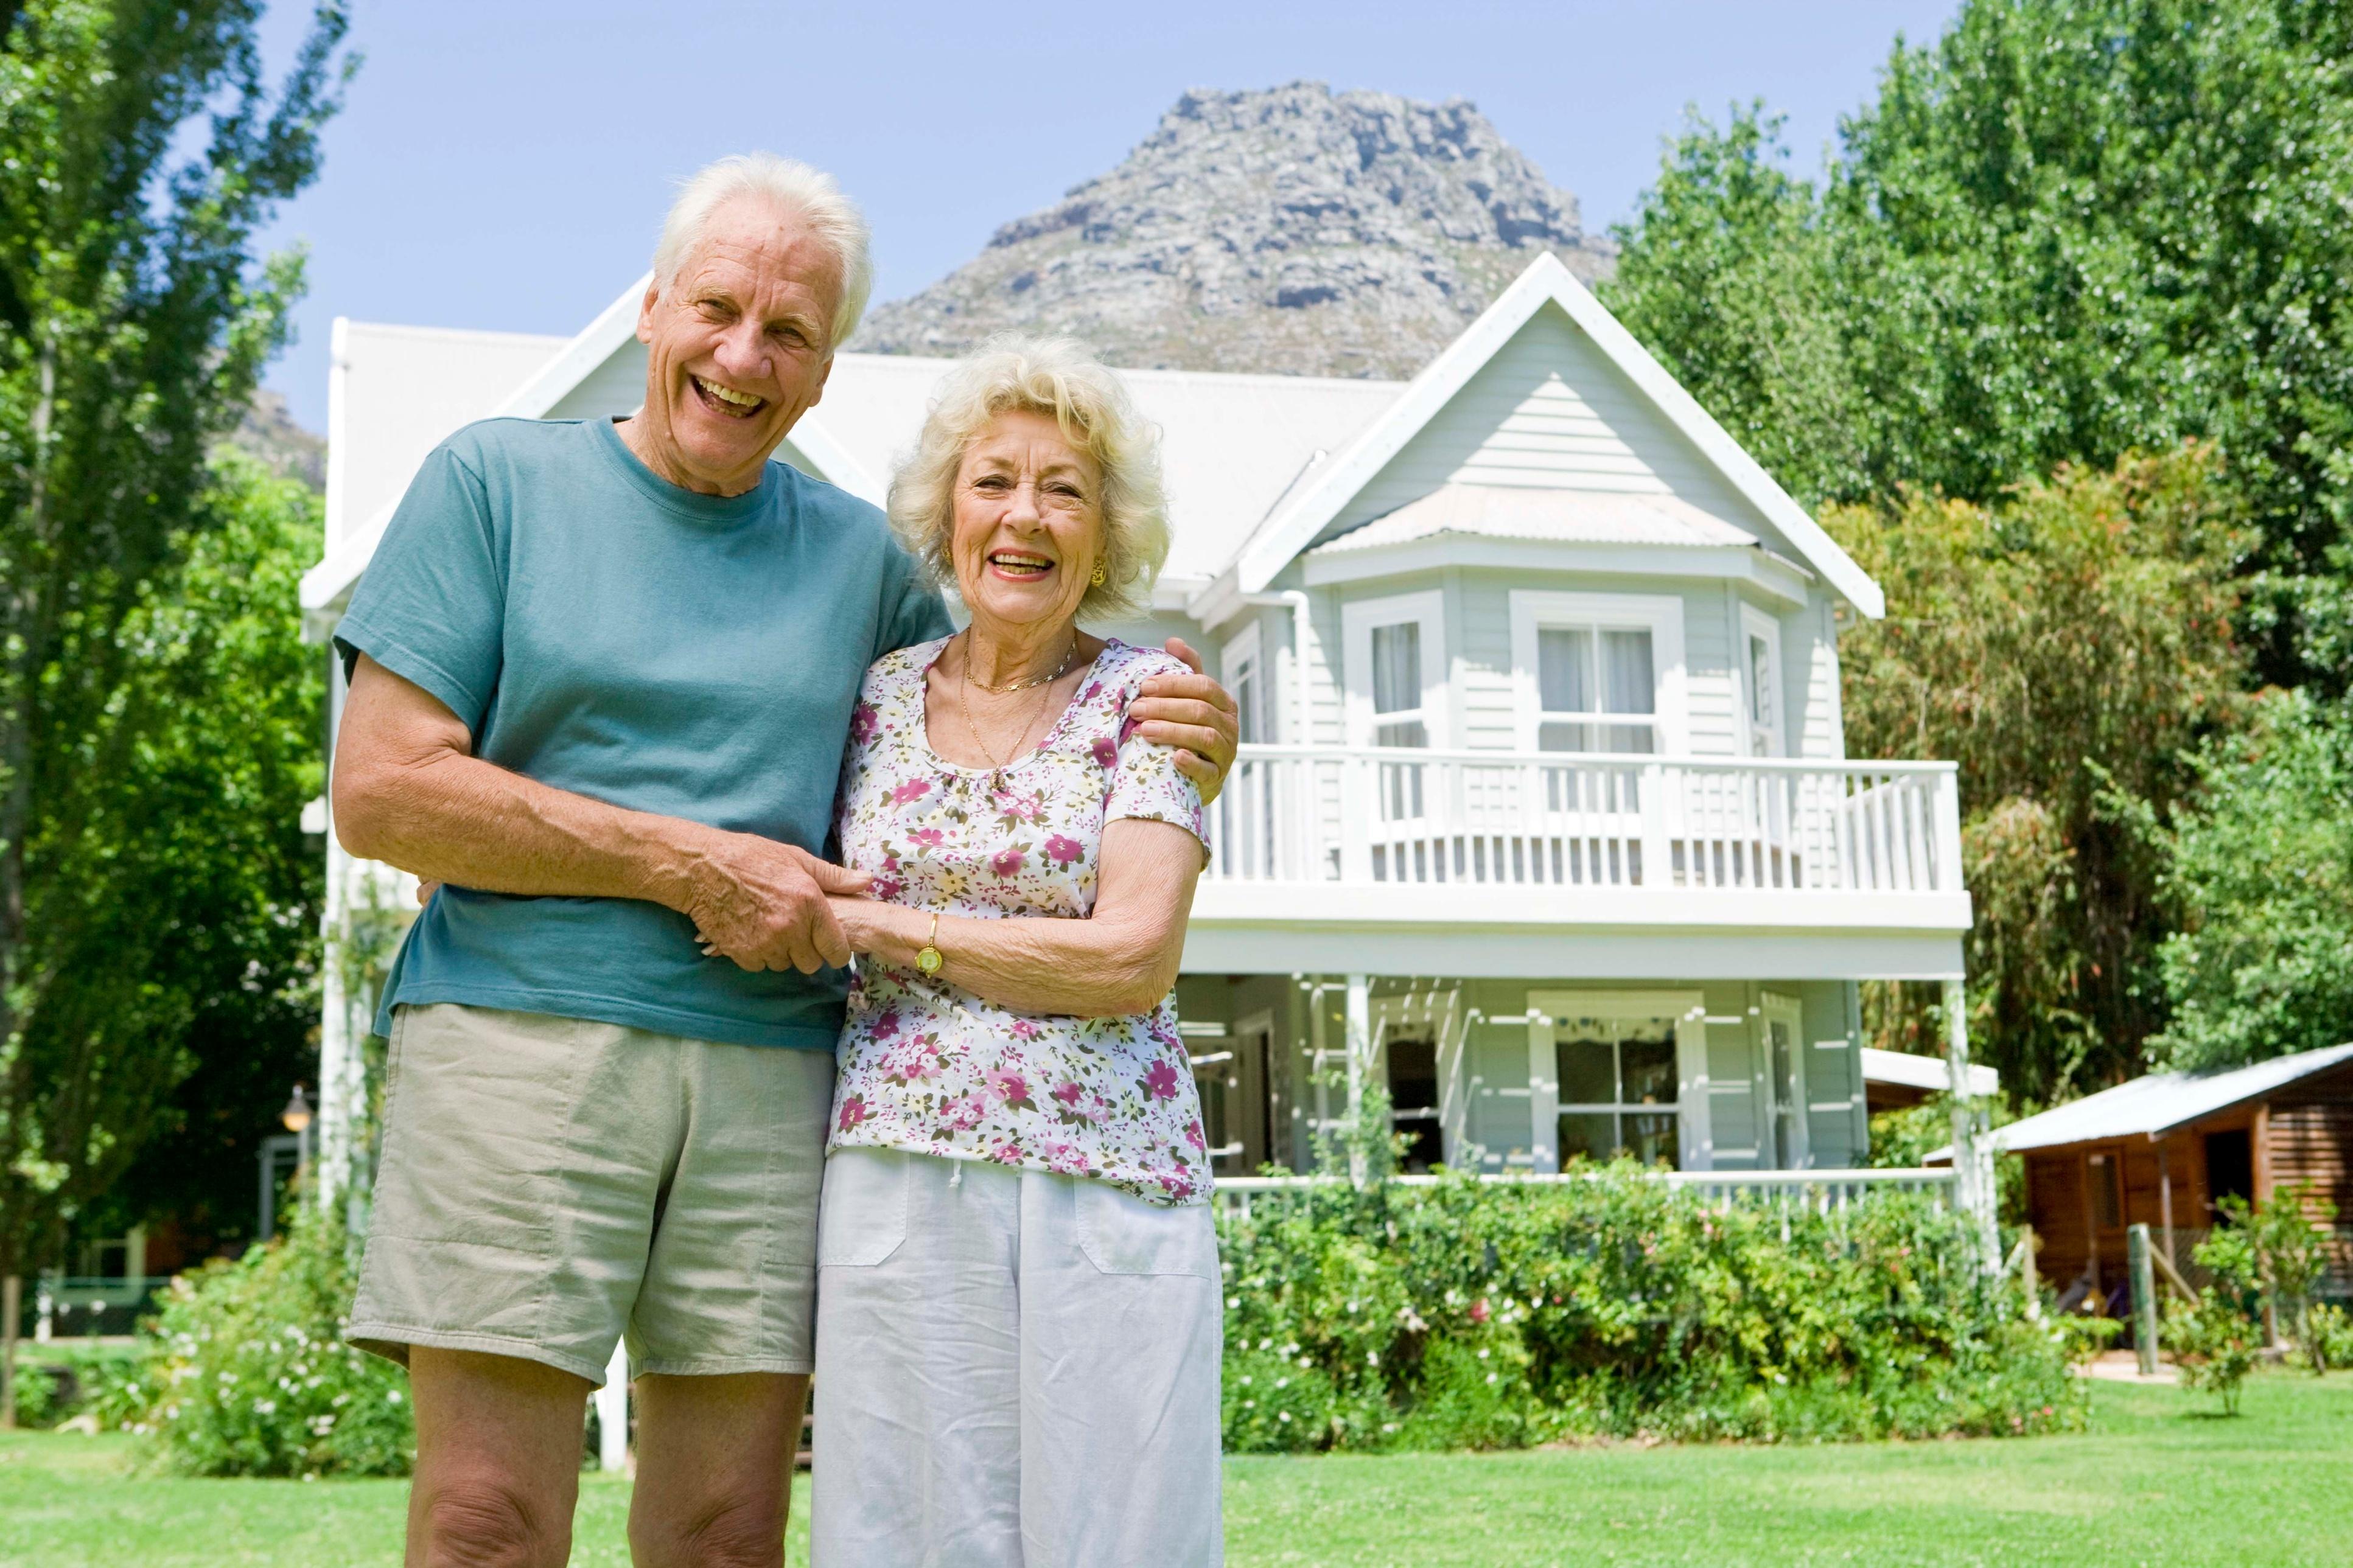 At fountaingrove lodge in santa rosa, a gay retirement community